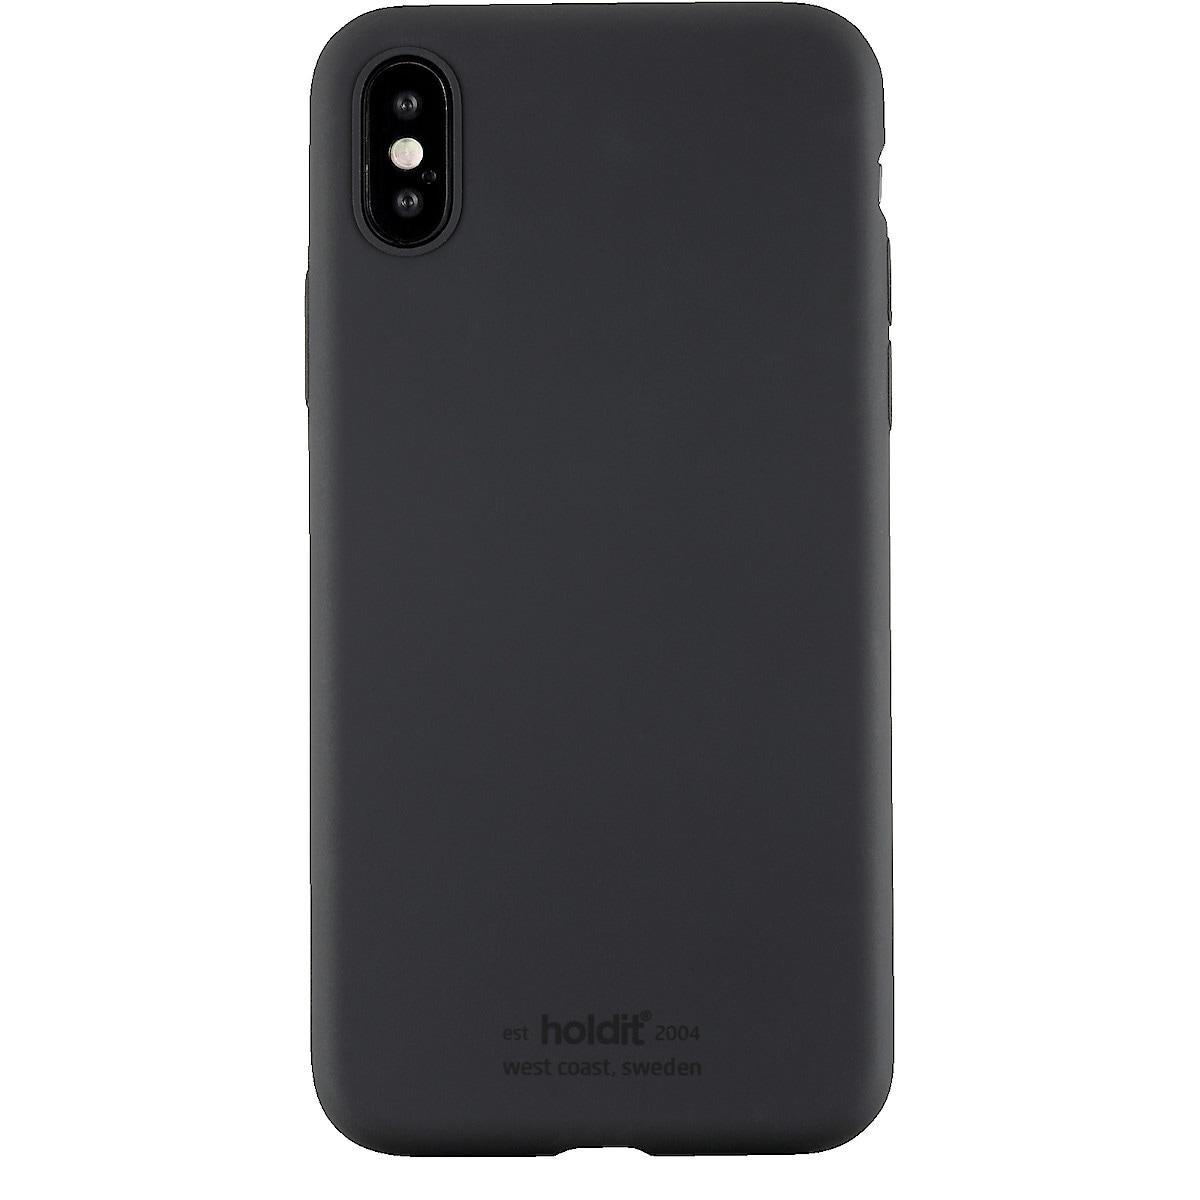 Mobilskal i silikon för iPhone X/XS Holdit